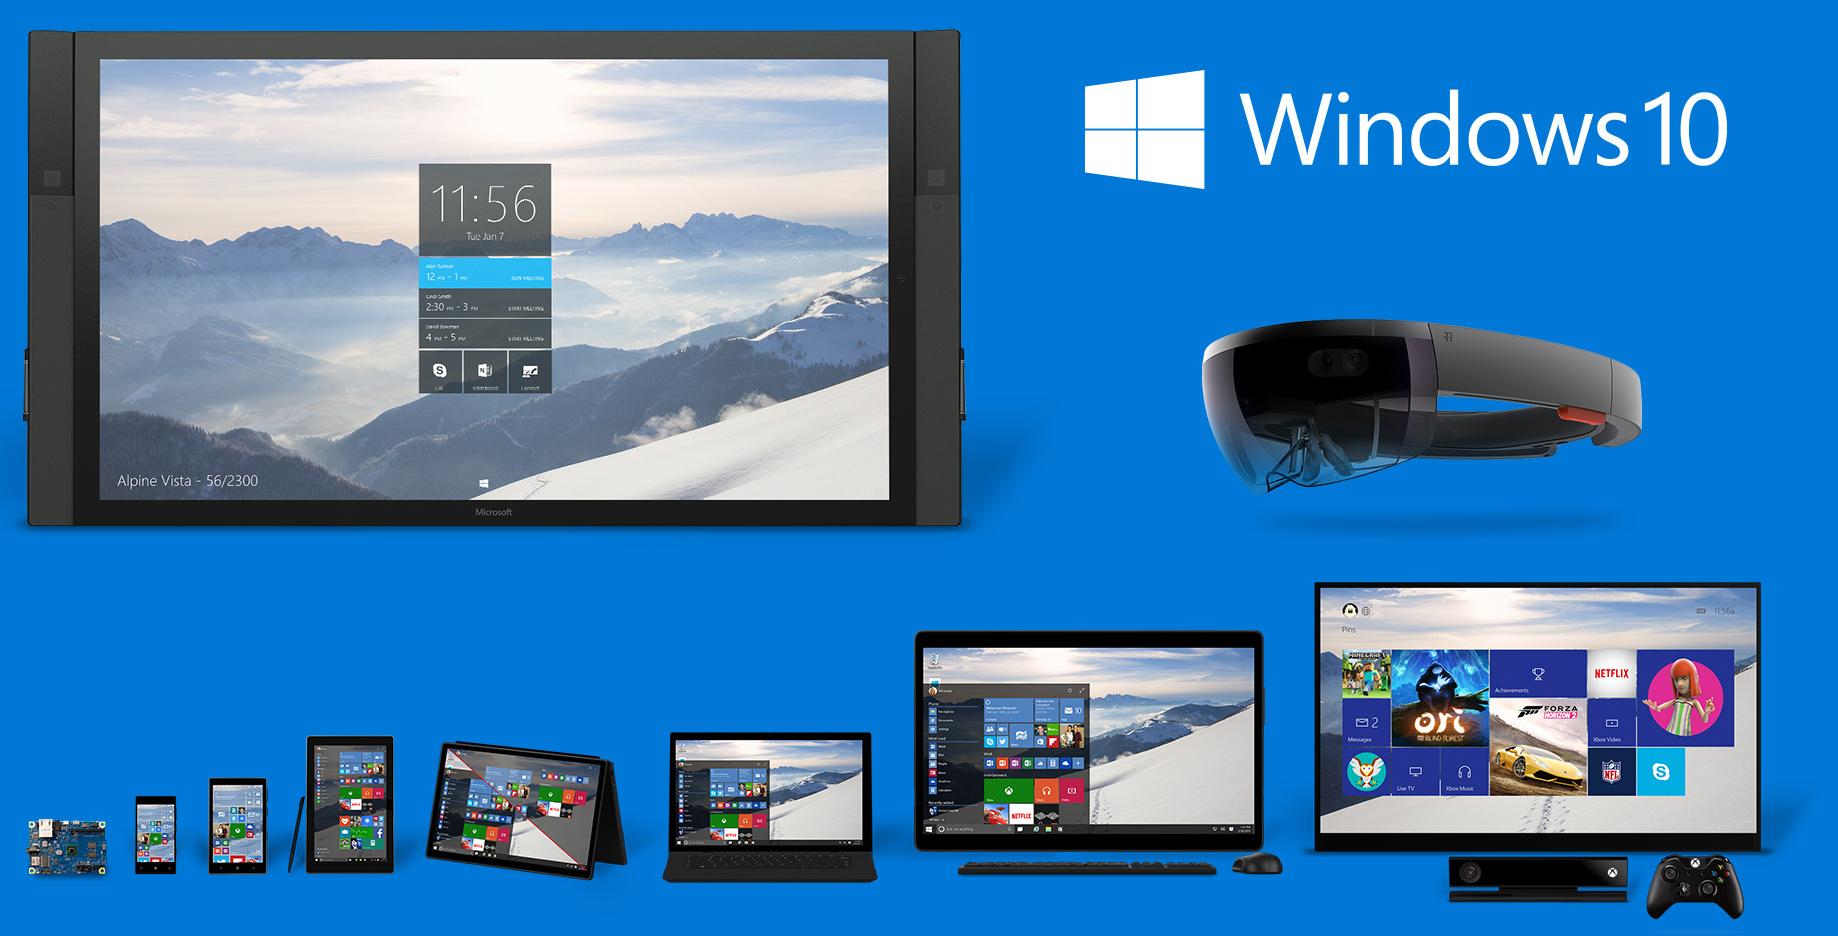 microsoft_windows_10_devices.jpg